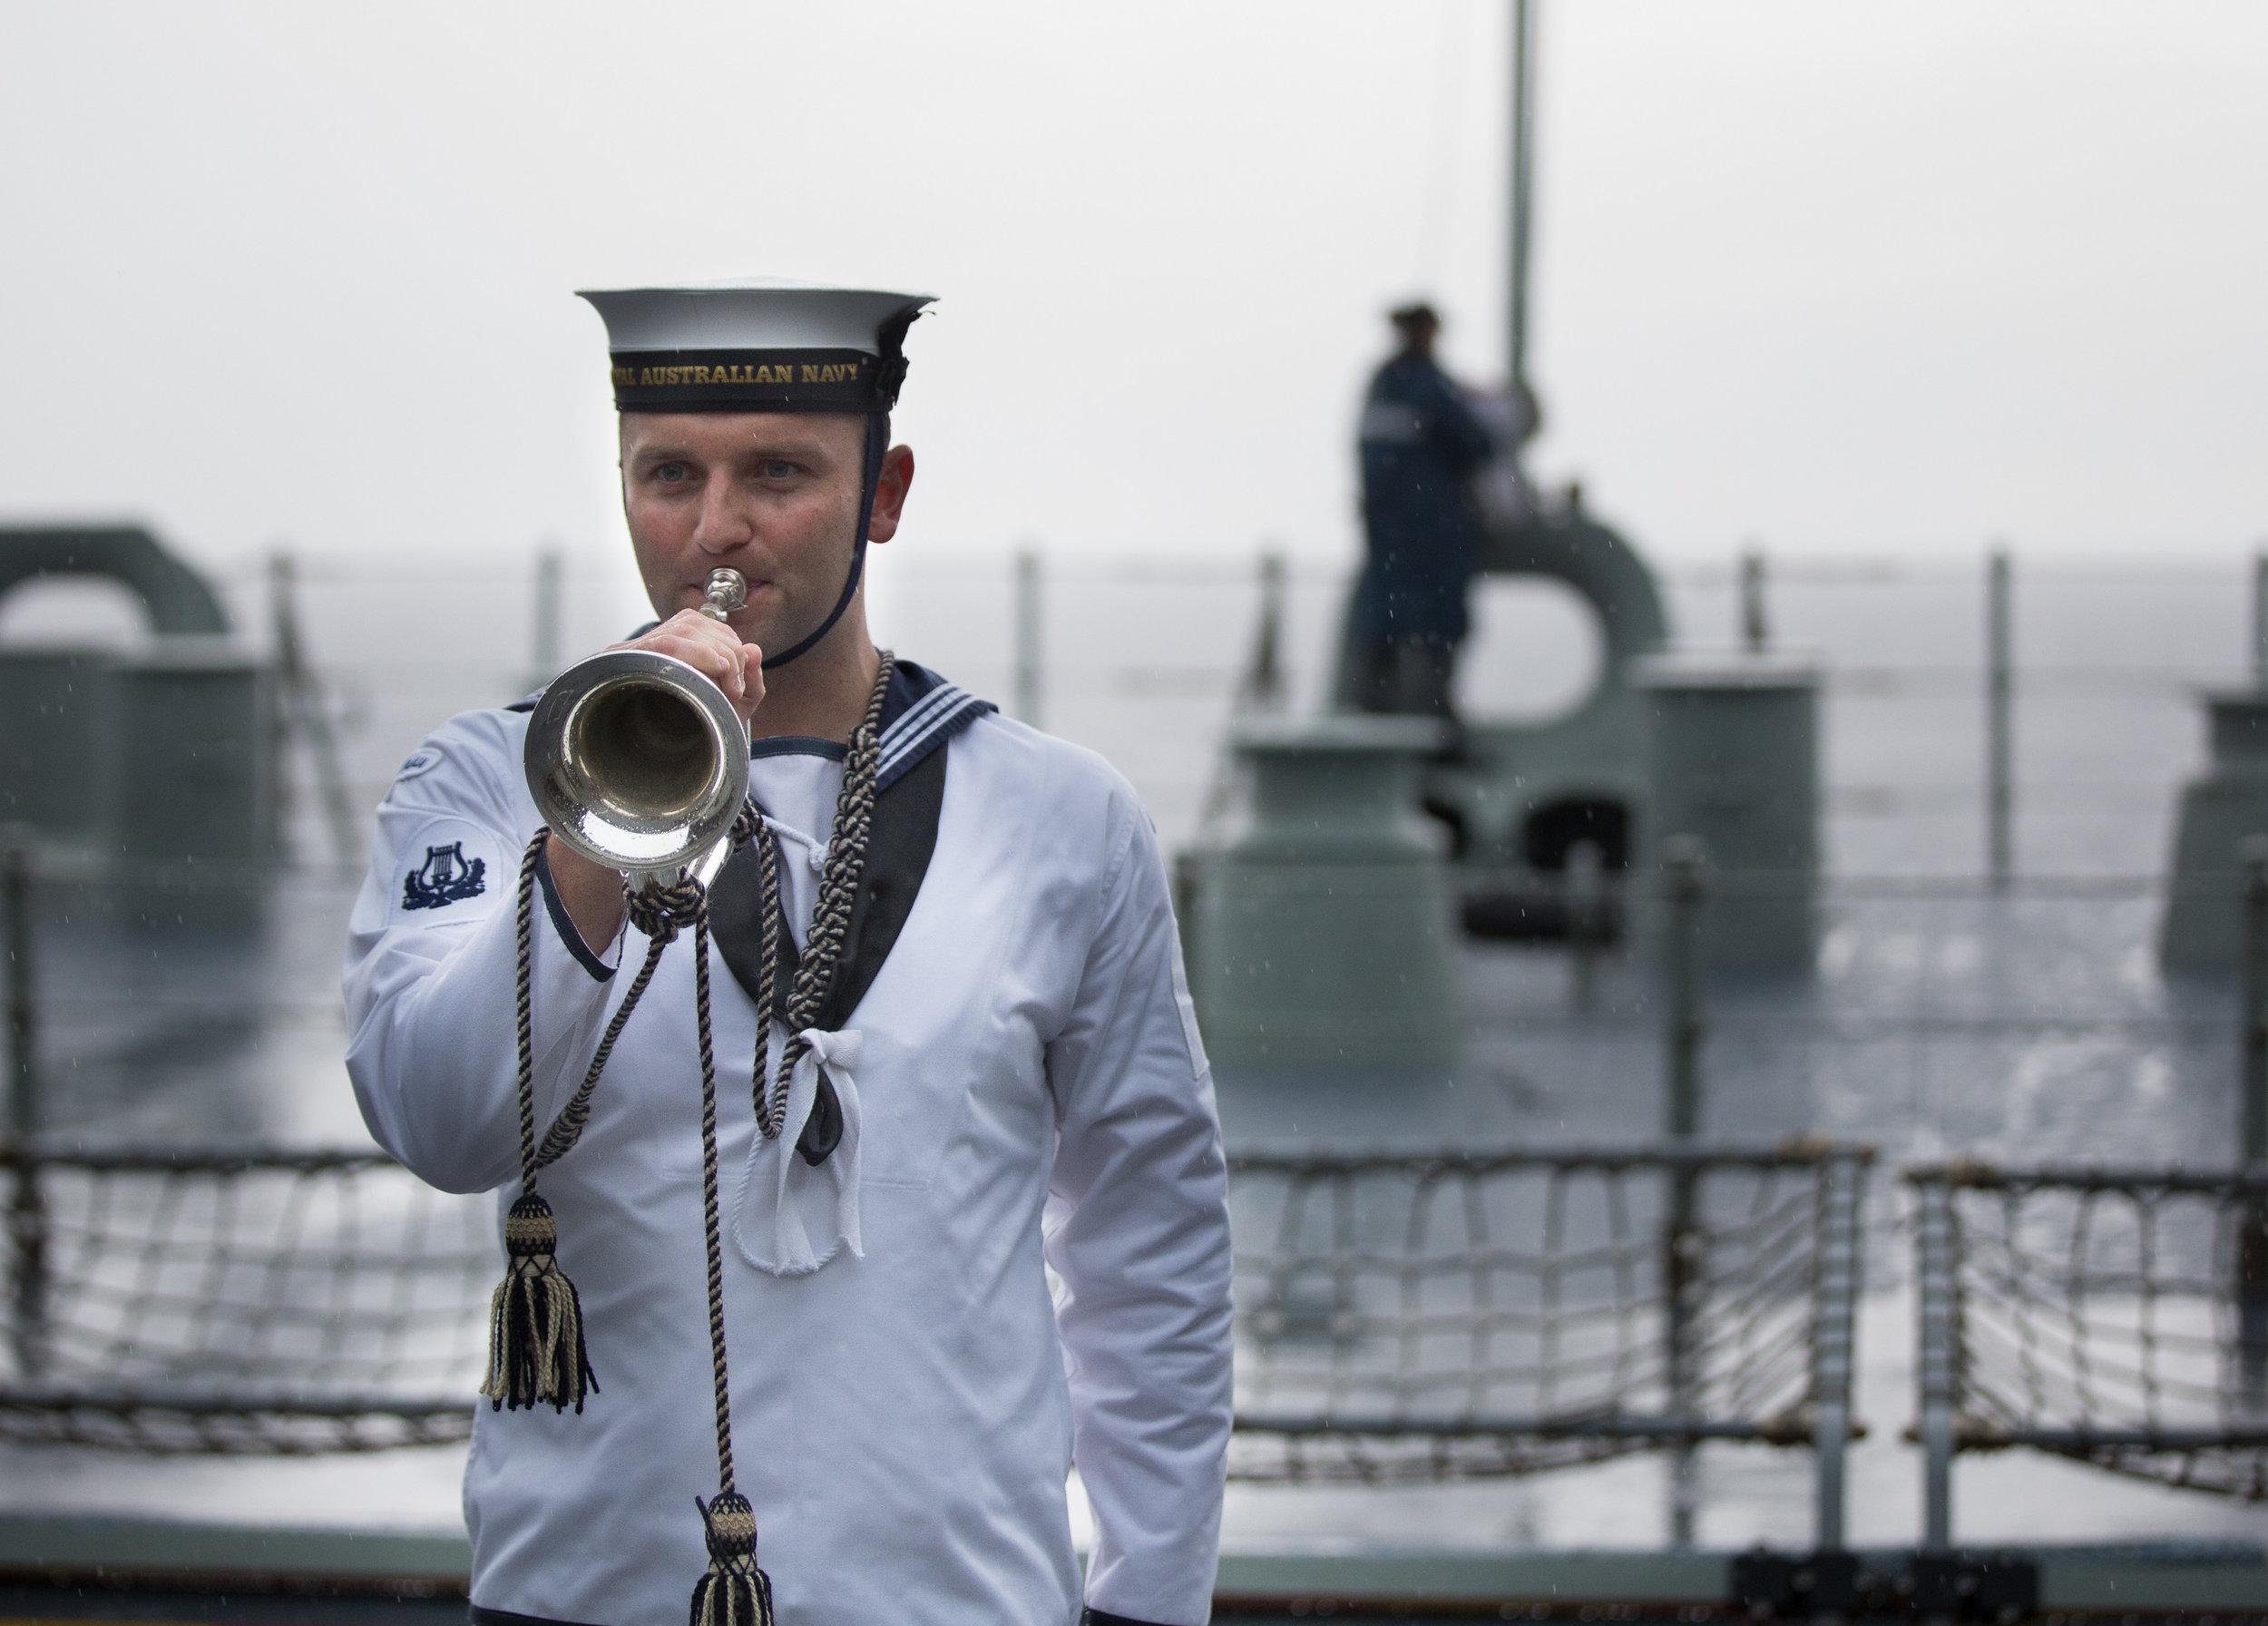 Ben plays the Last Post on HMAS Adelaide 2018